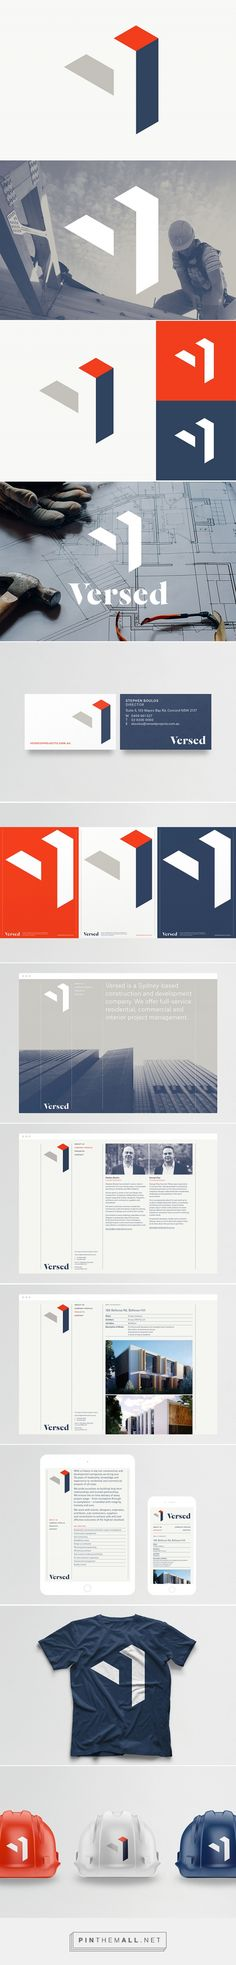 Identity / Versed /Christopher Doyle & Co.